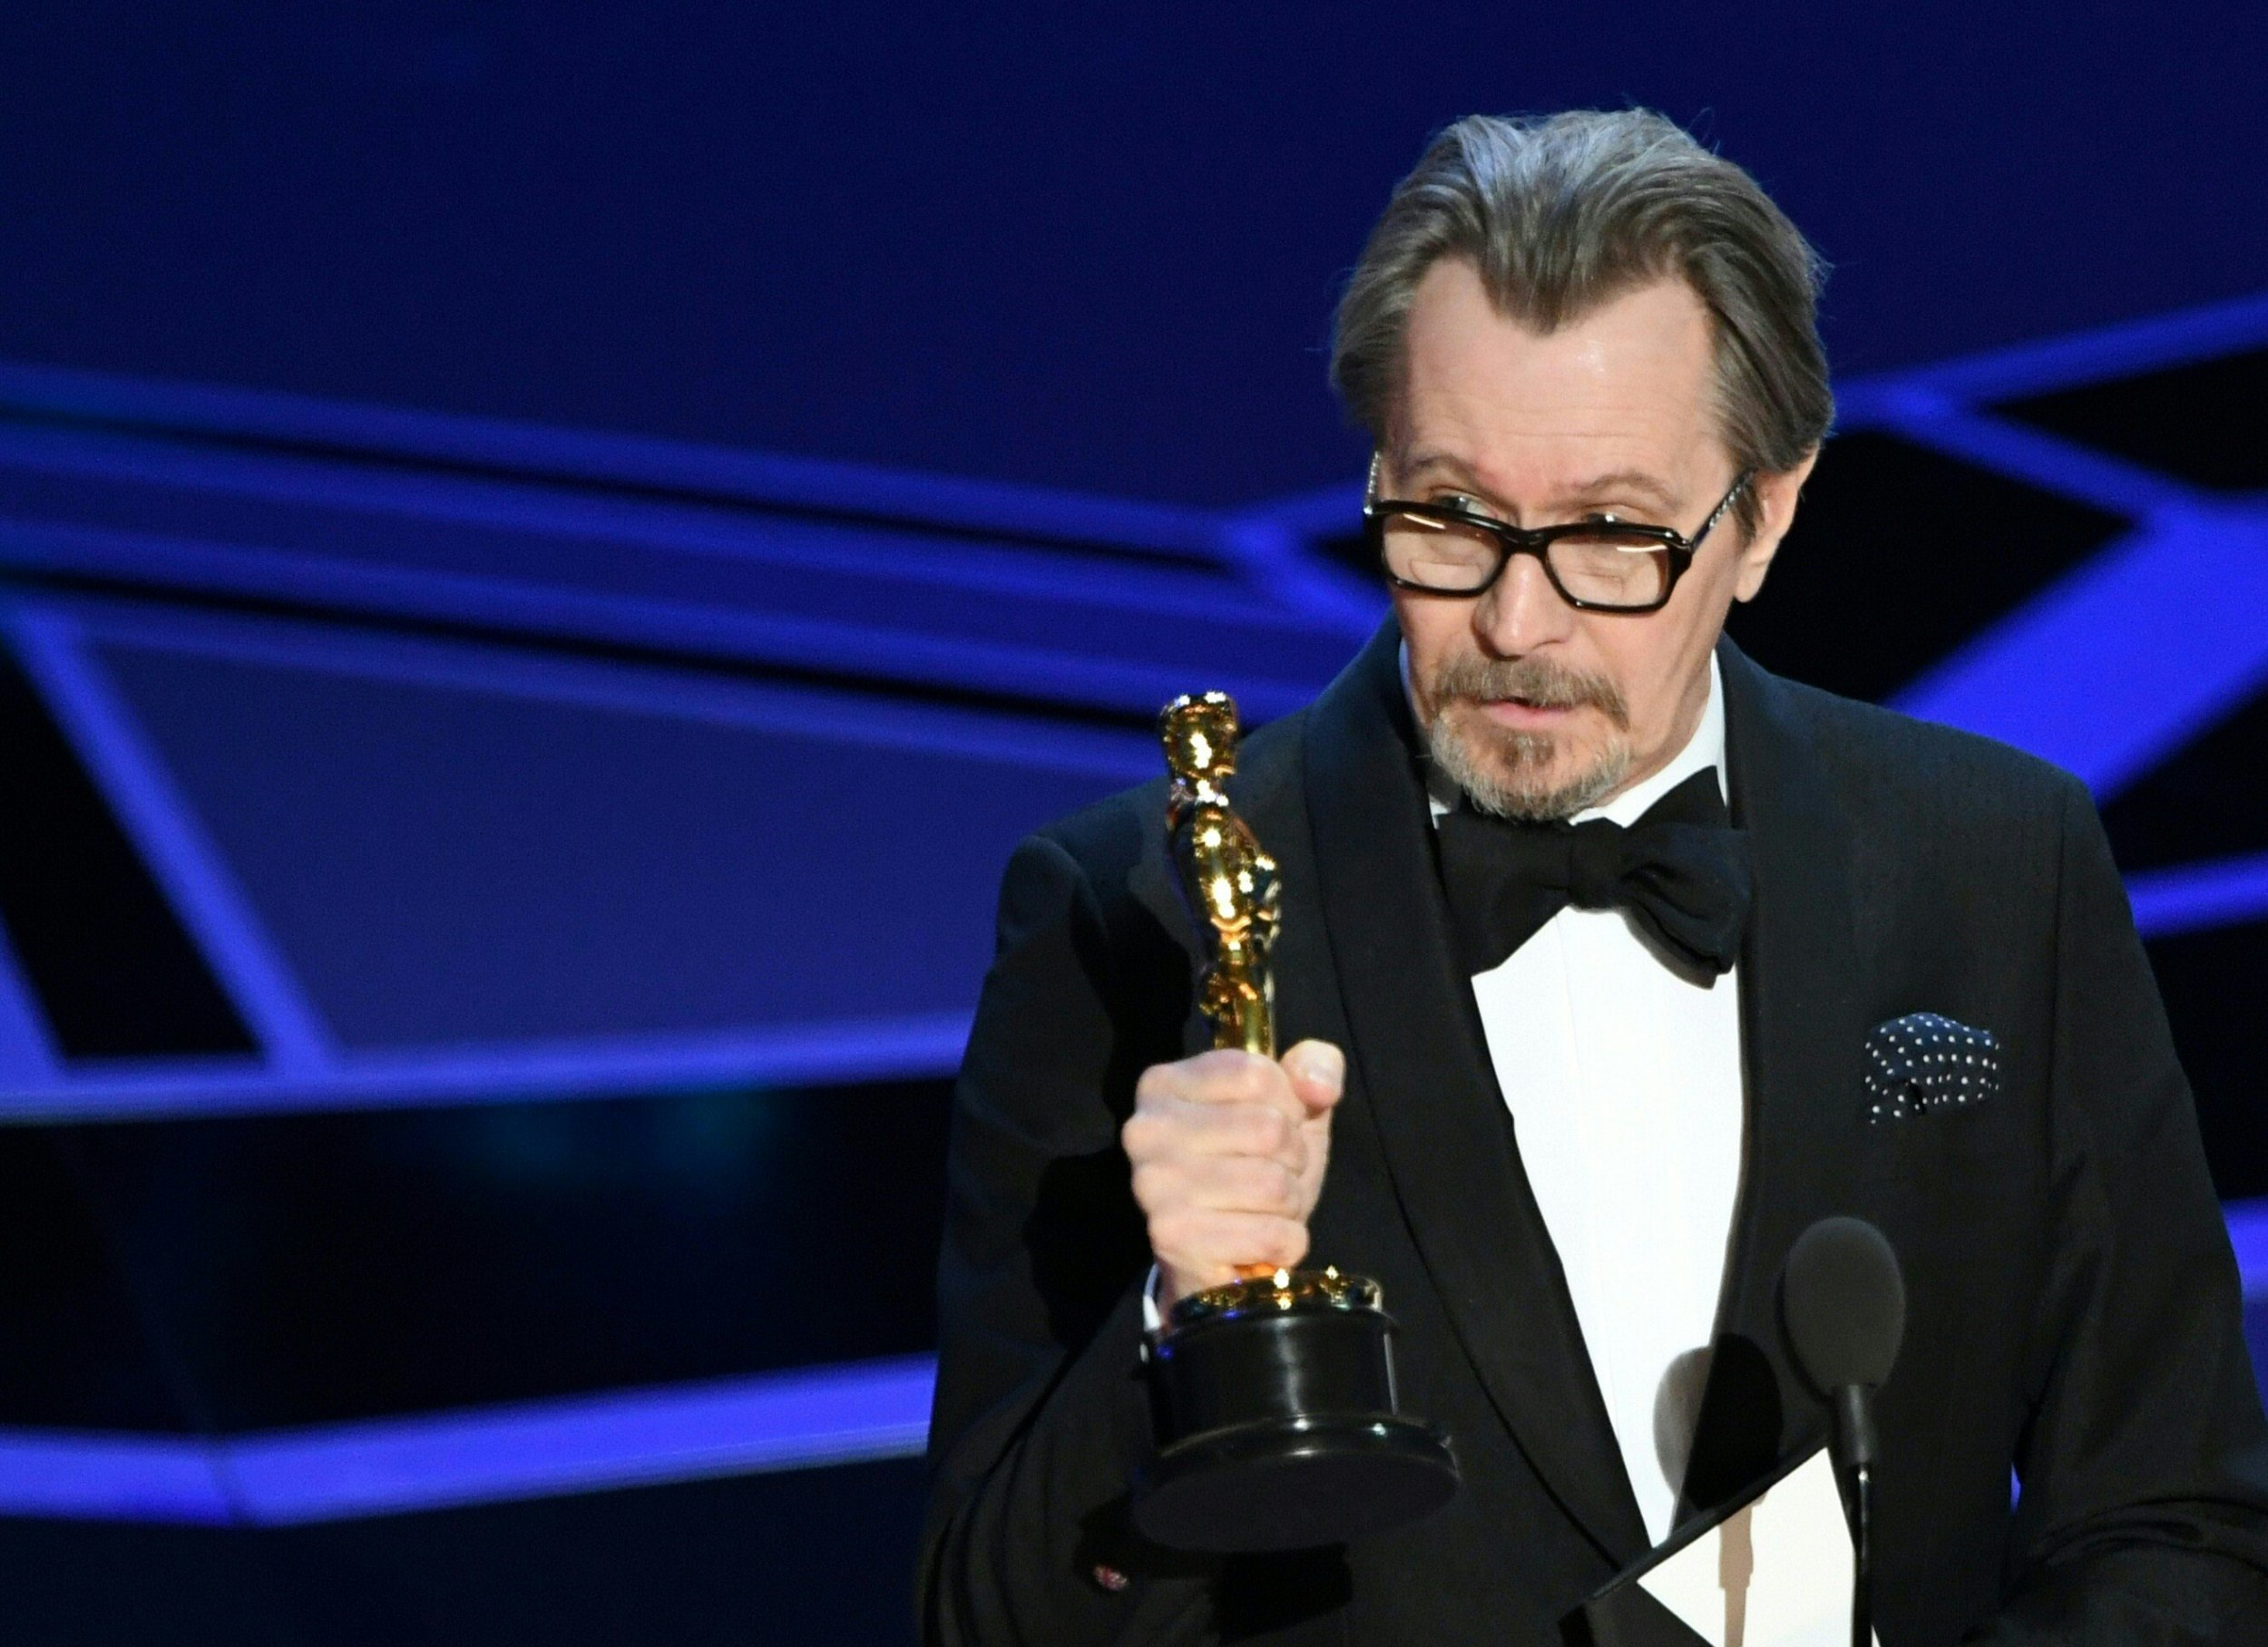 Oscar winners 2018 – who won from Gary Oldman to Frances McDormand